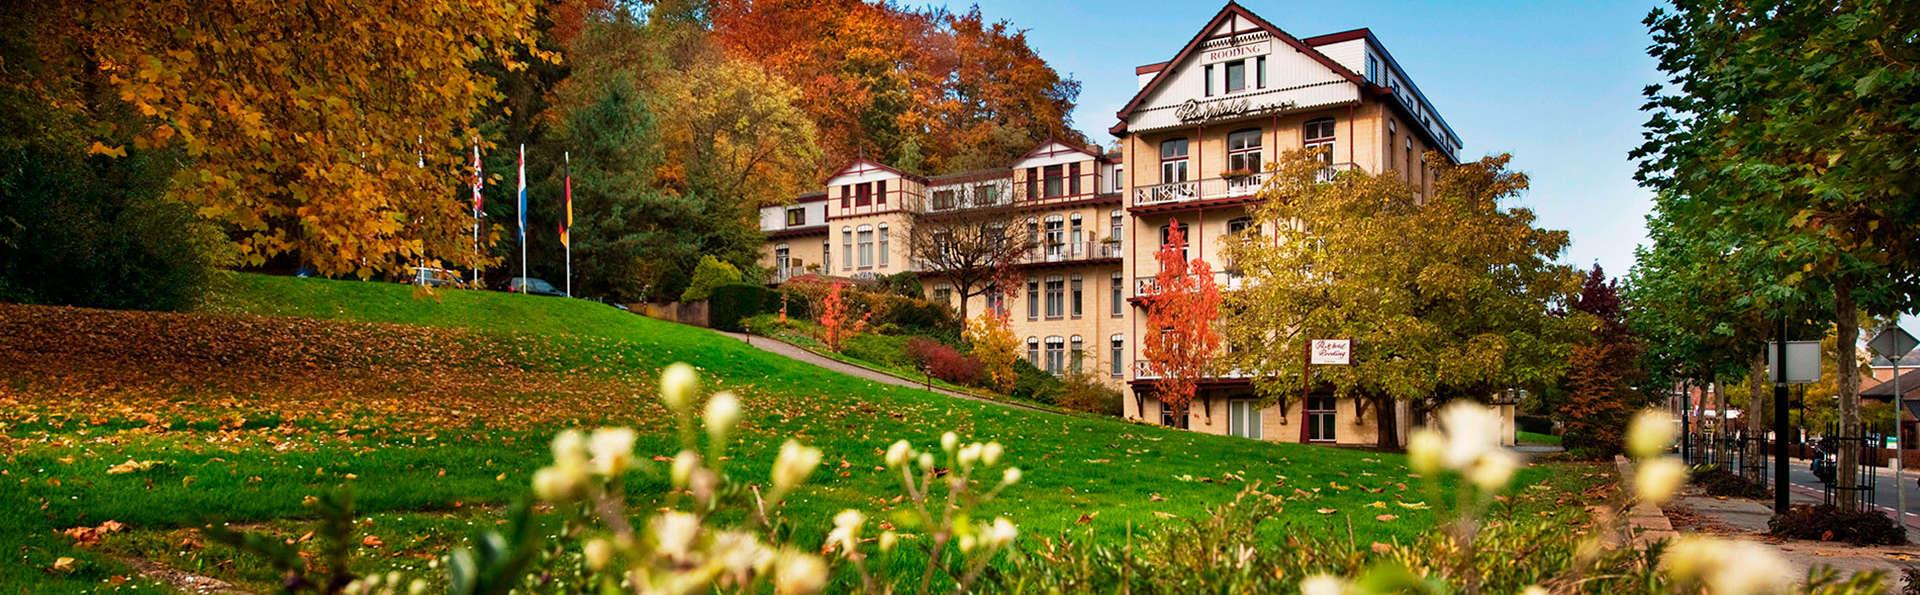 Parkhotel Valkenburg - EDIT_front1.jpg